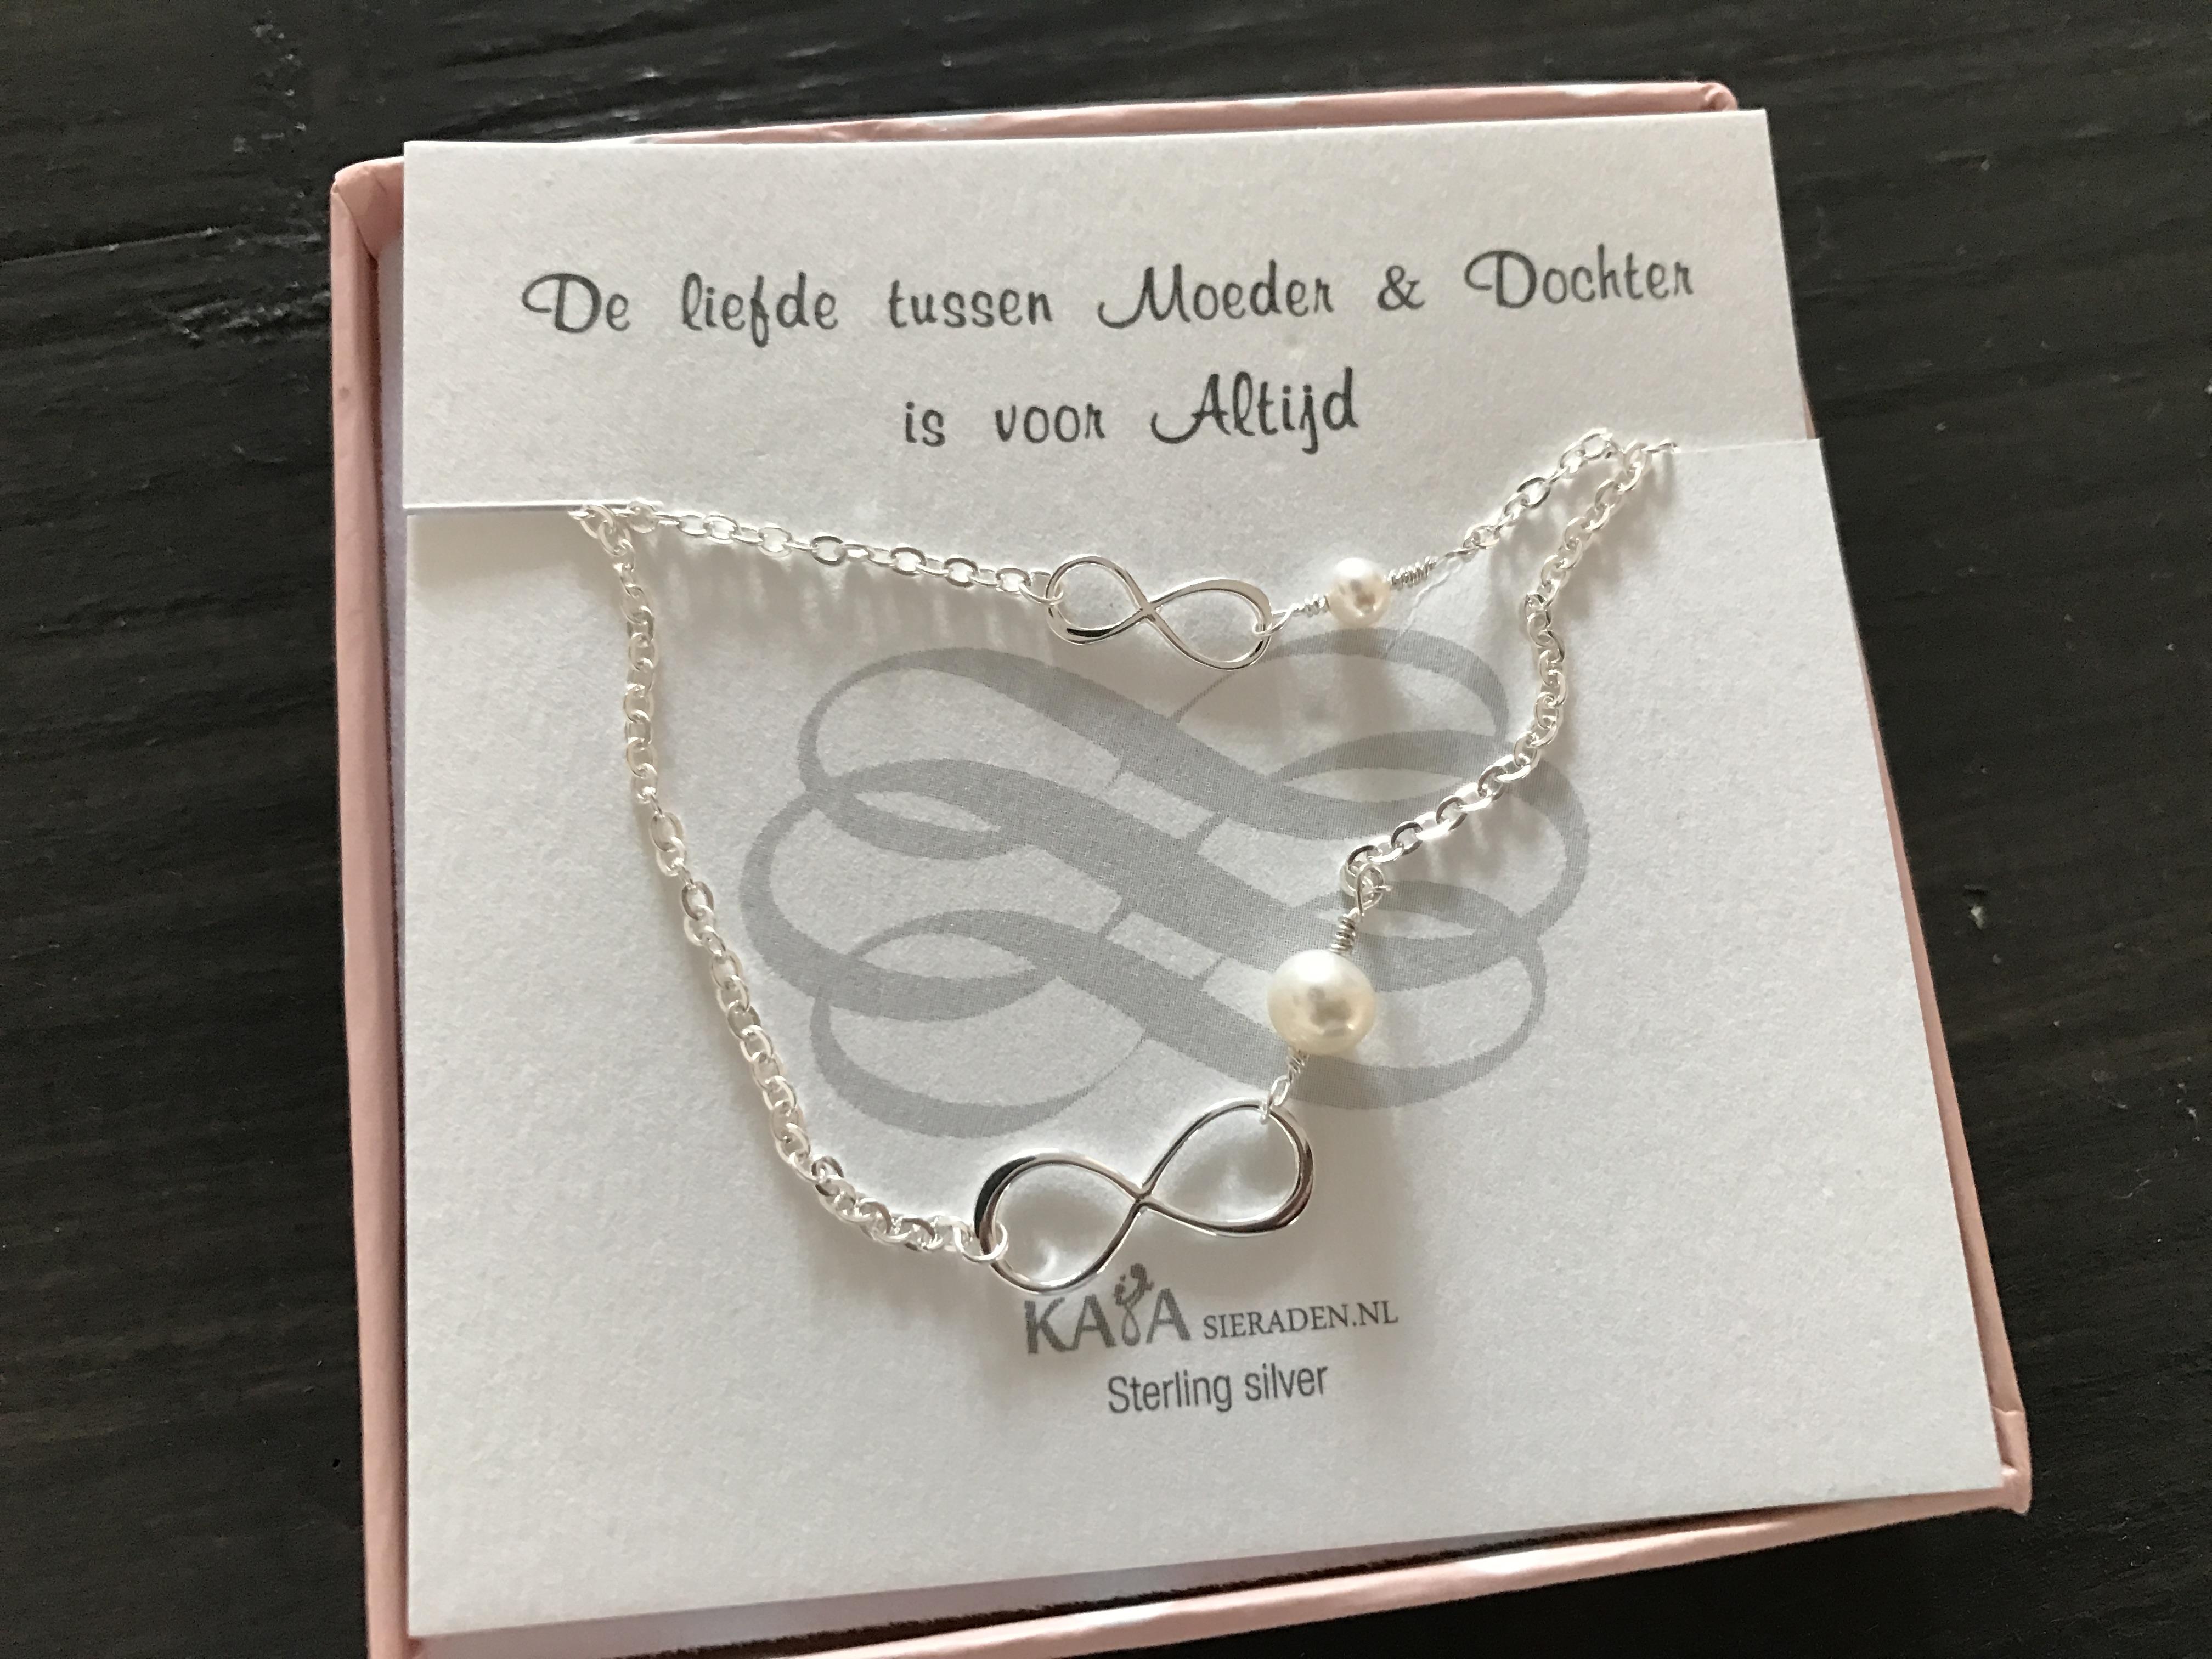 10-16-kaya-sieraad-sieraden-moeder-dochter-armband-infinity-teken-symbool-mooi-kraamcadeau-origineel-verpakking